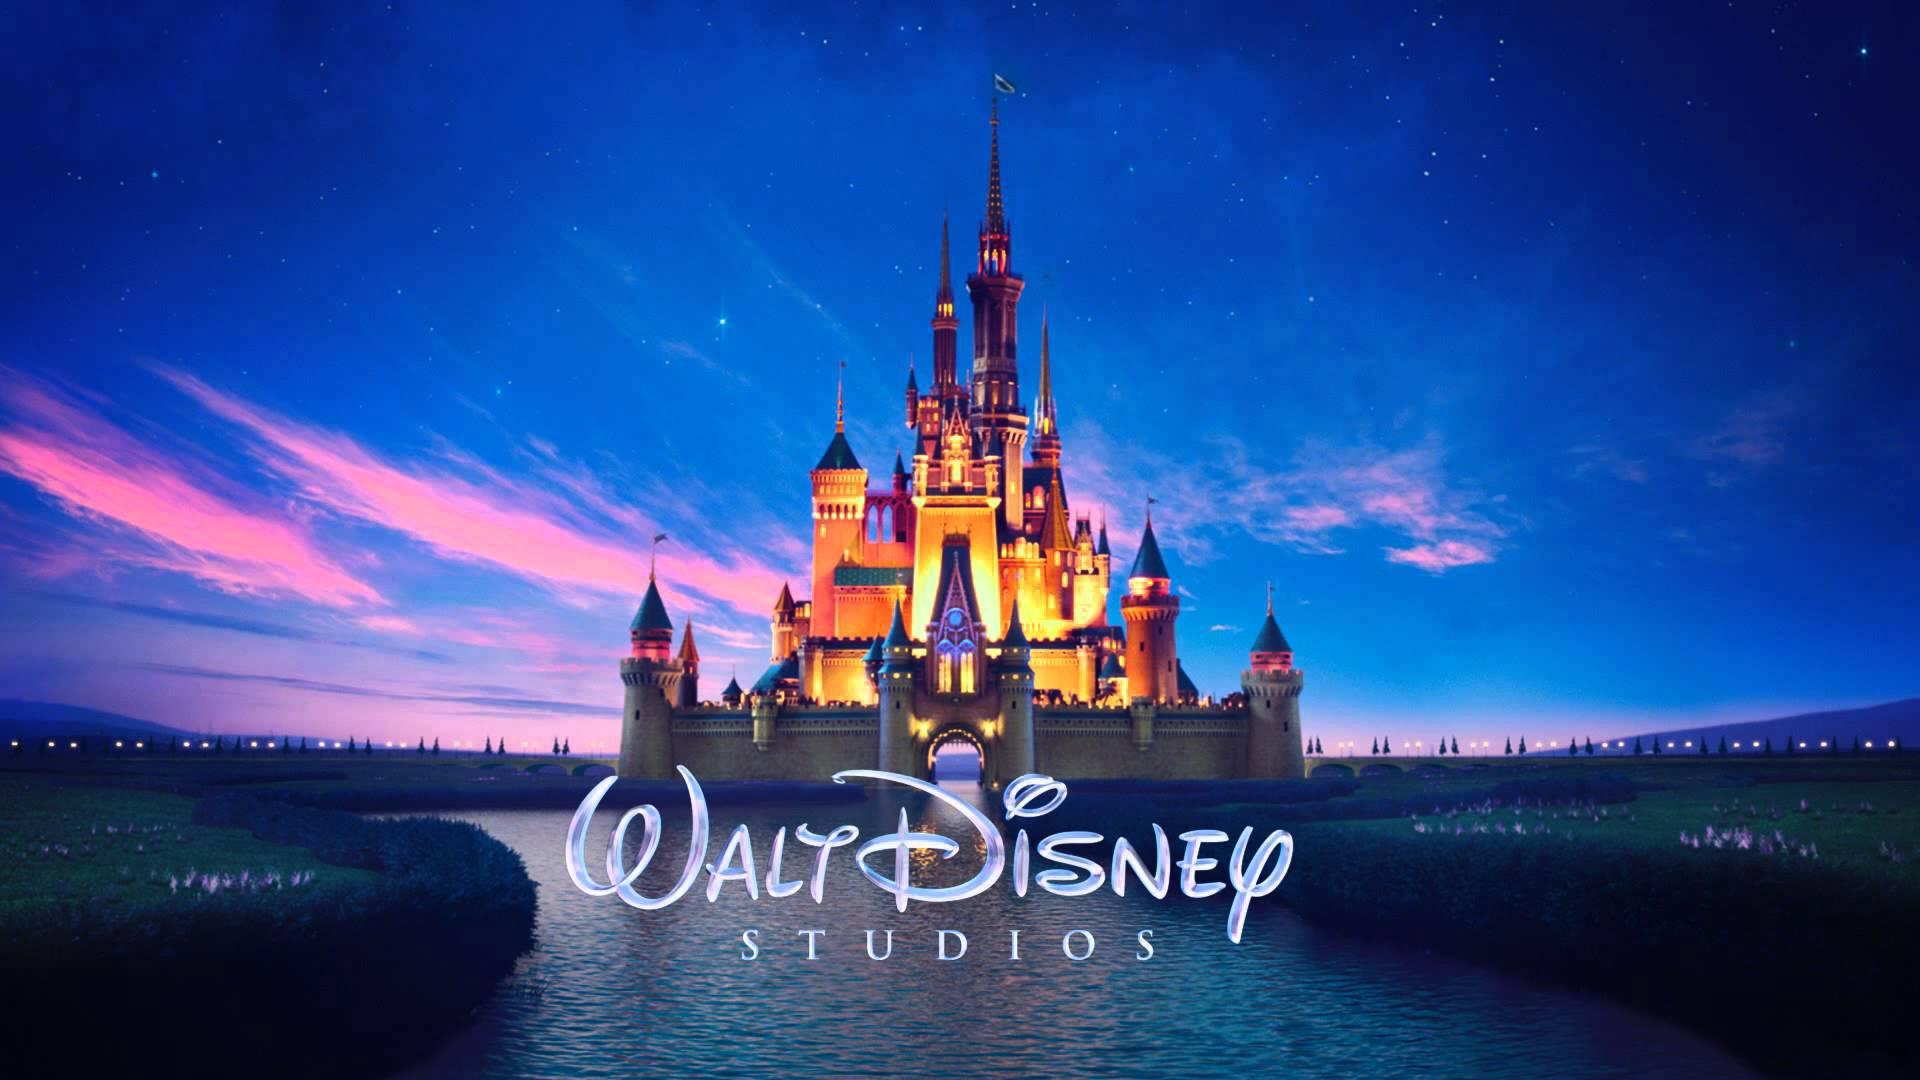 Disney Firma Acuerdo para 21st Century Fox – Nuevo Panorama de Entretenimiento